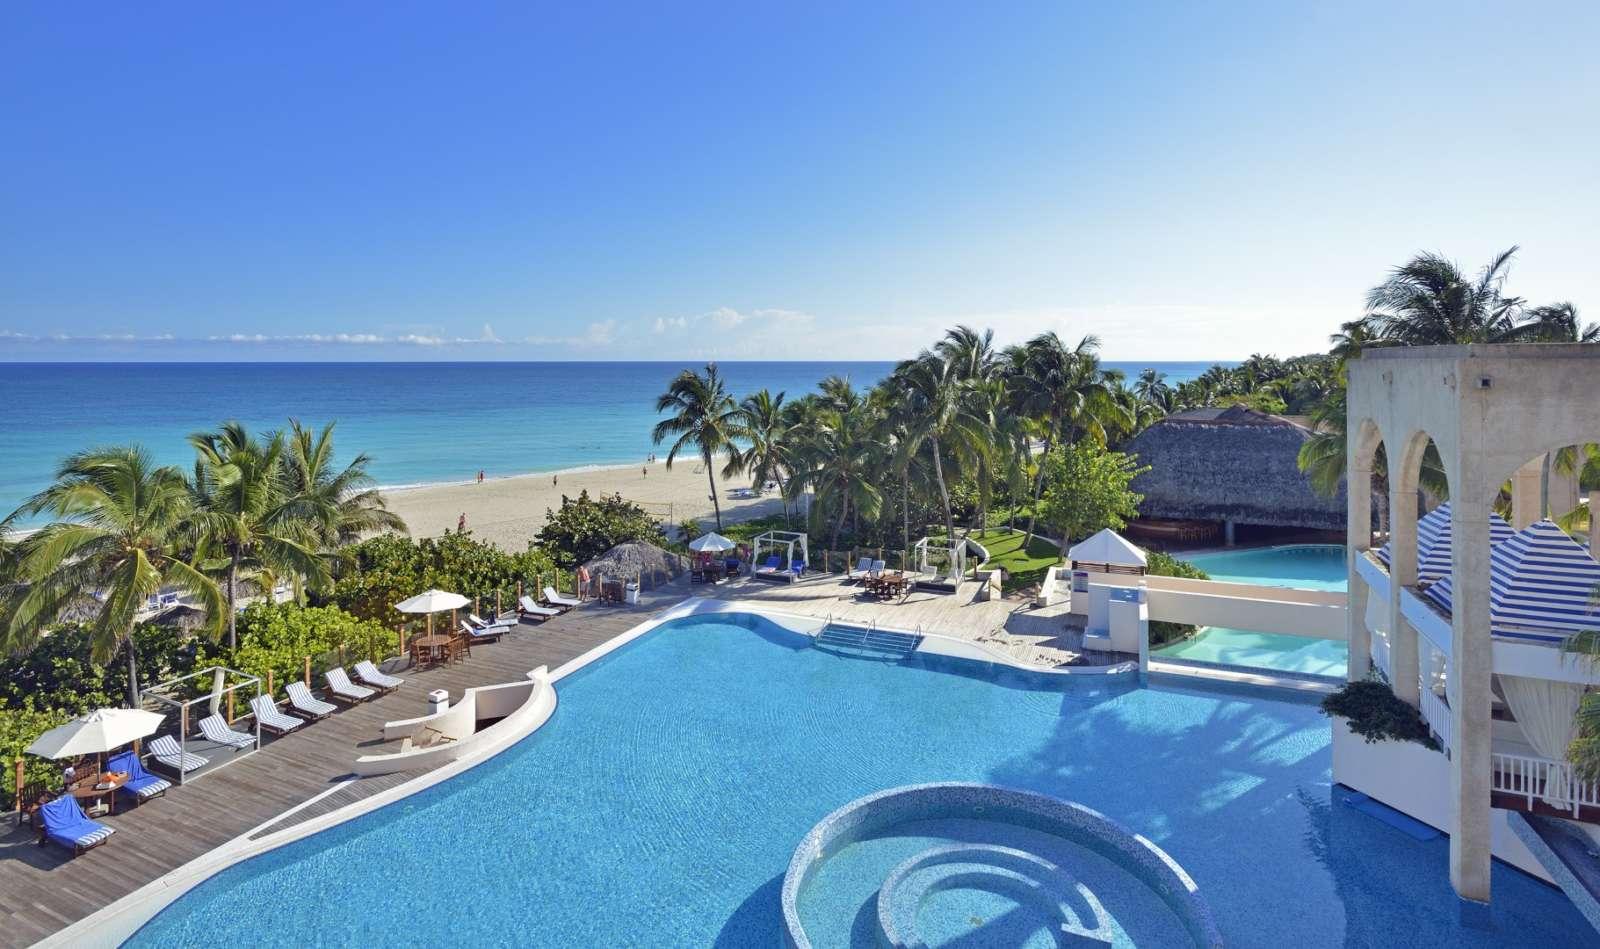 Melia Las Americas pool and beach view